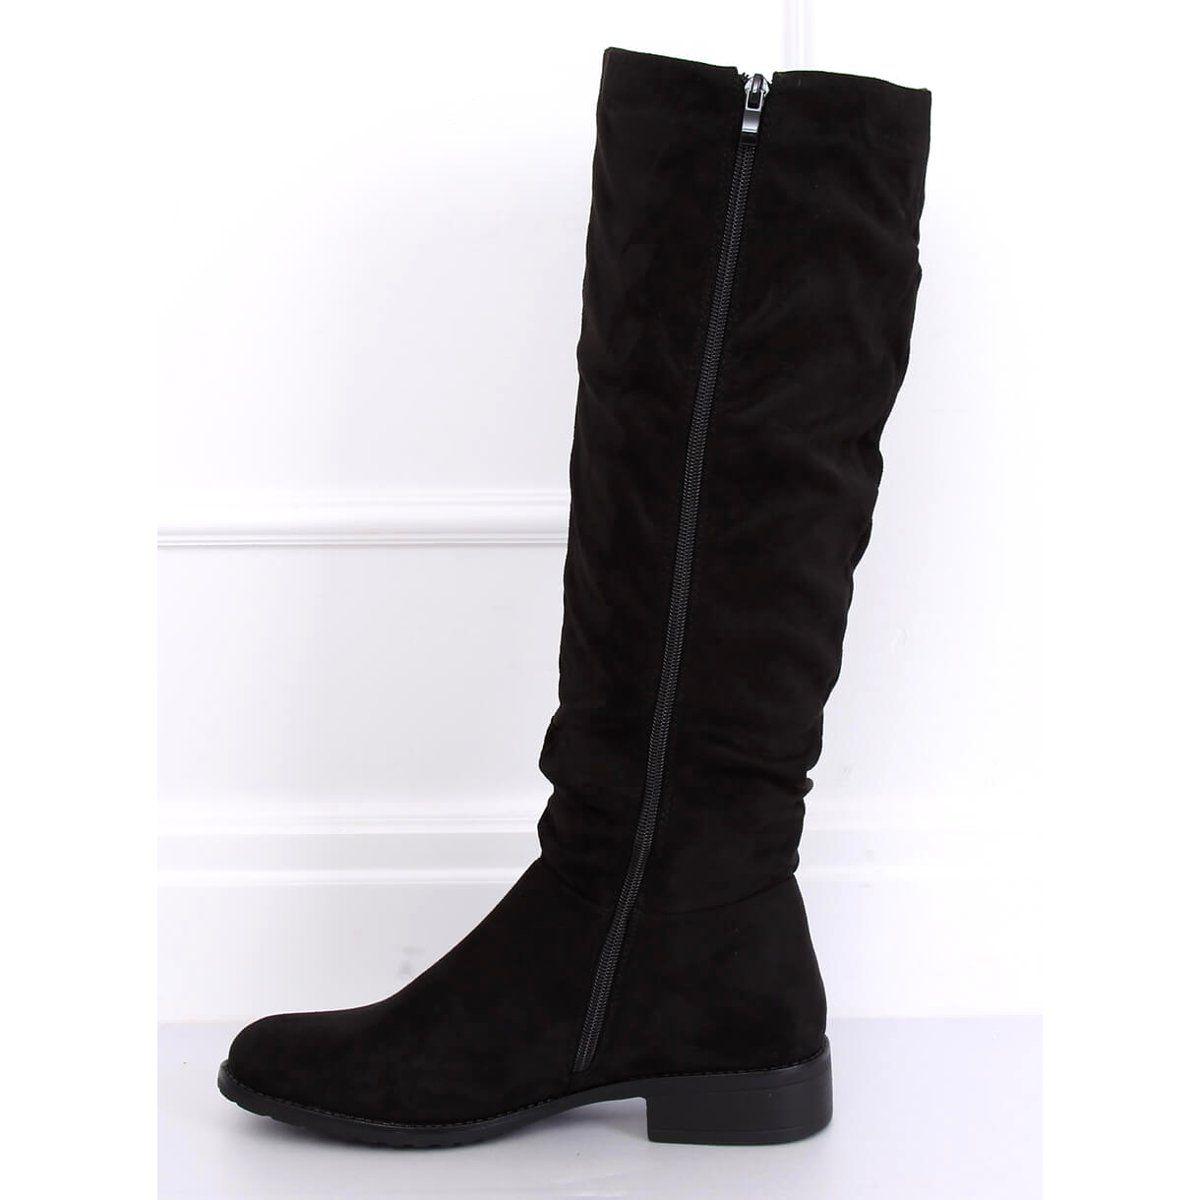 Oficerki Damskie Zamszowe Czarne E9308 Black Womens Suede Boots Boots Womens Knee High Boots